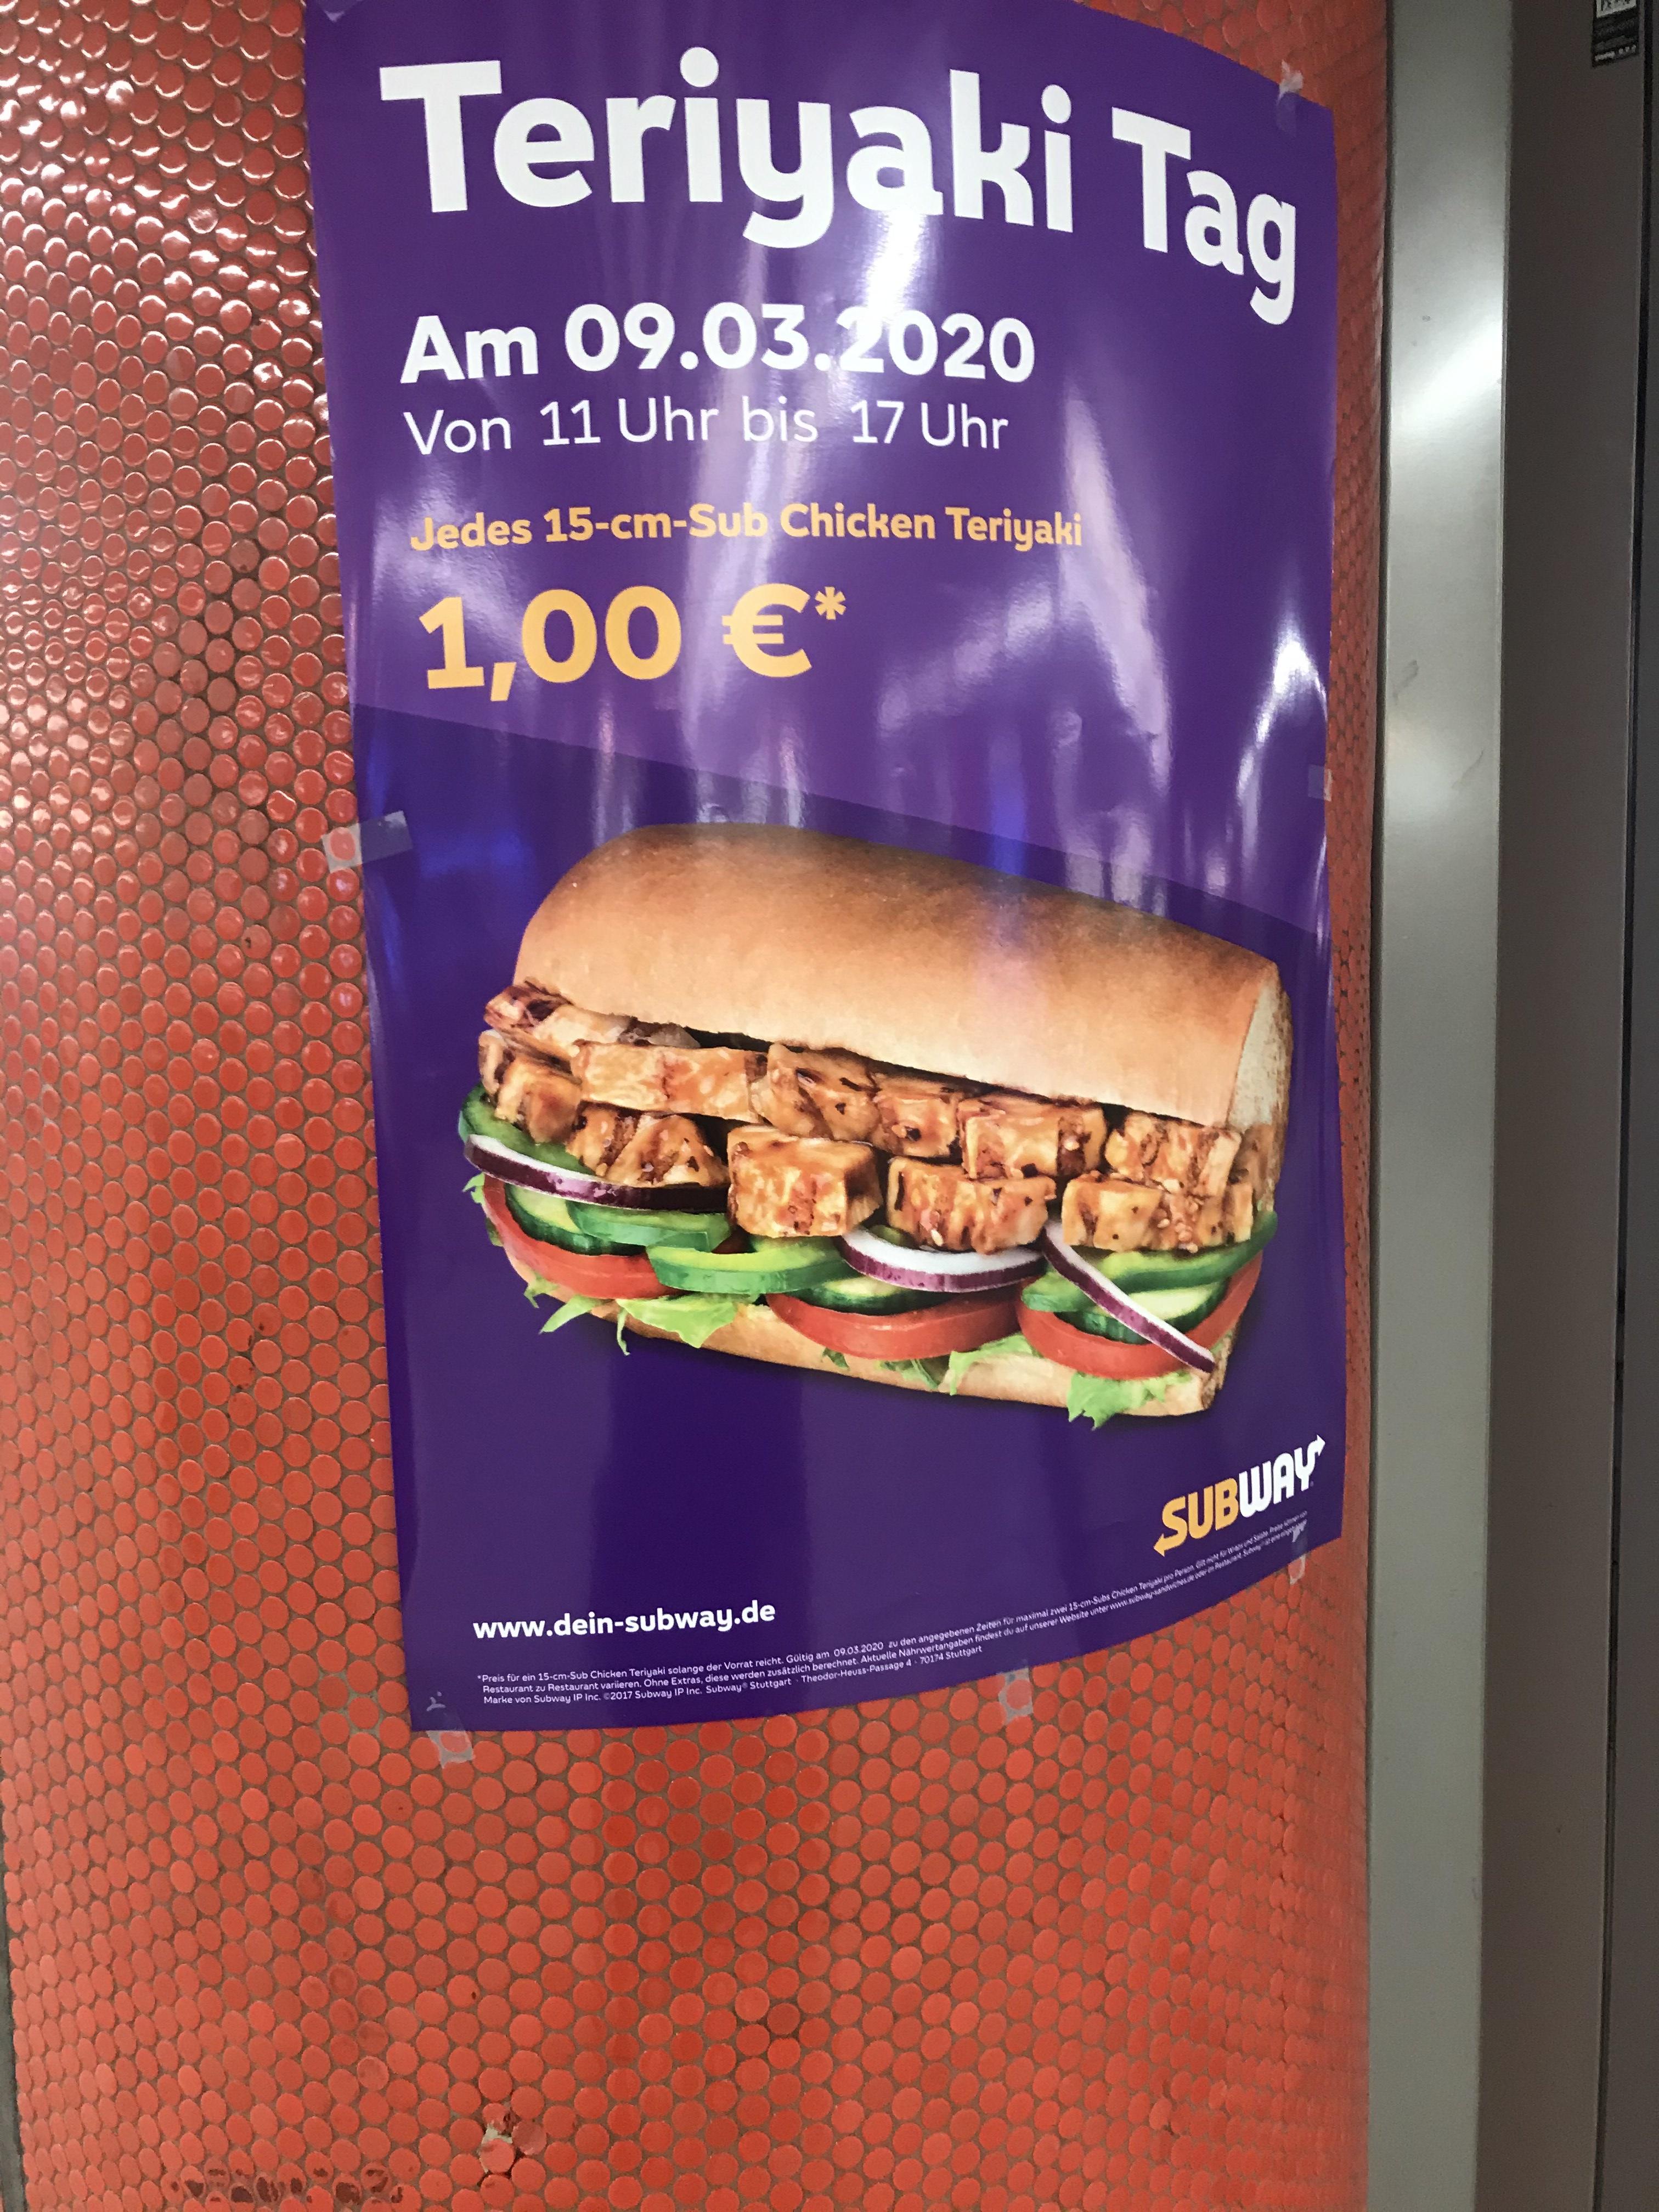 Lokal* Stuttgart Subway Heute 9.3.2020 Teriyaki 1€